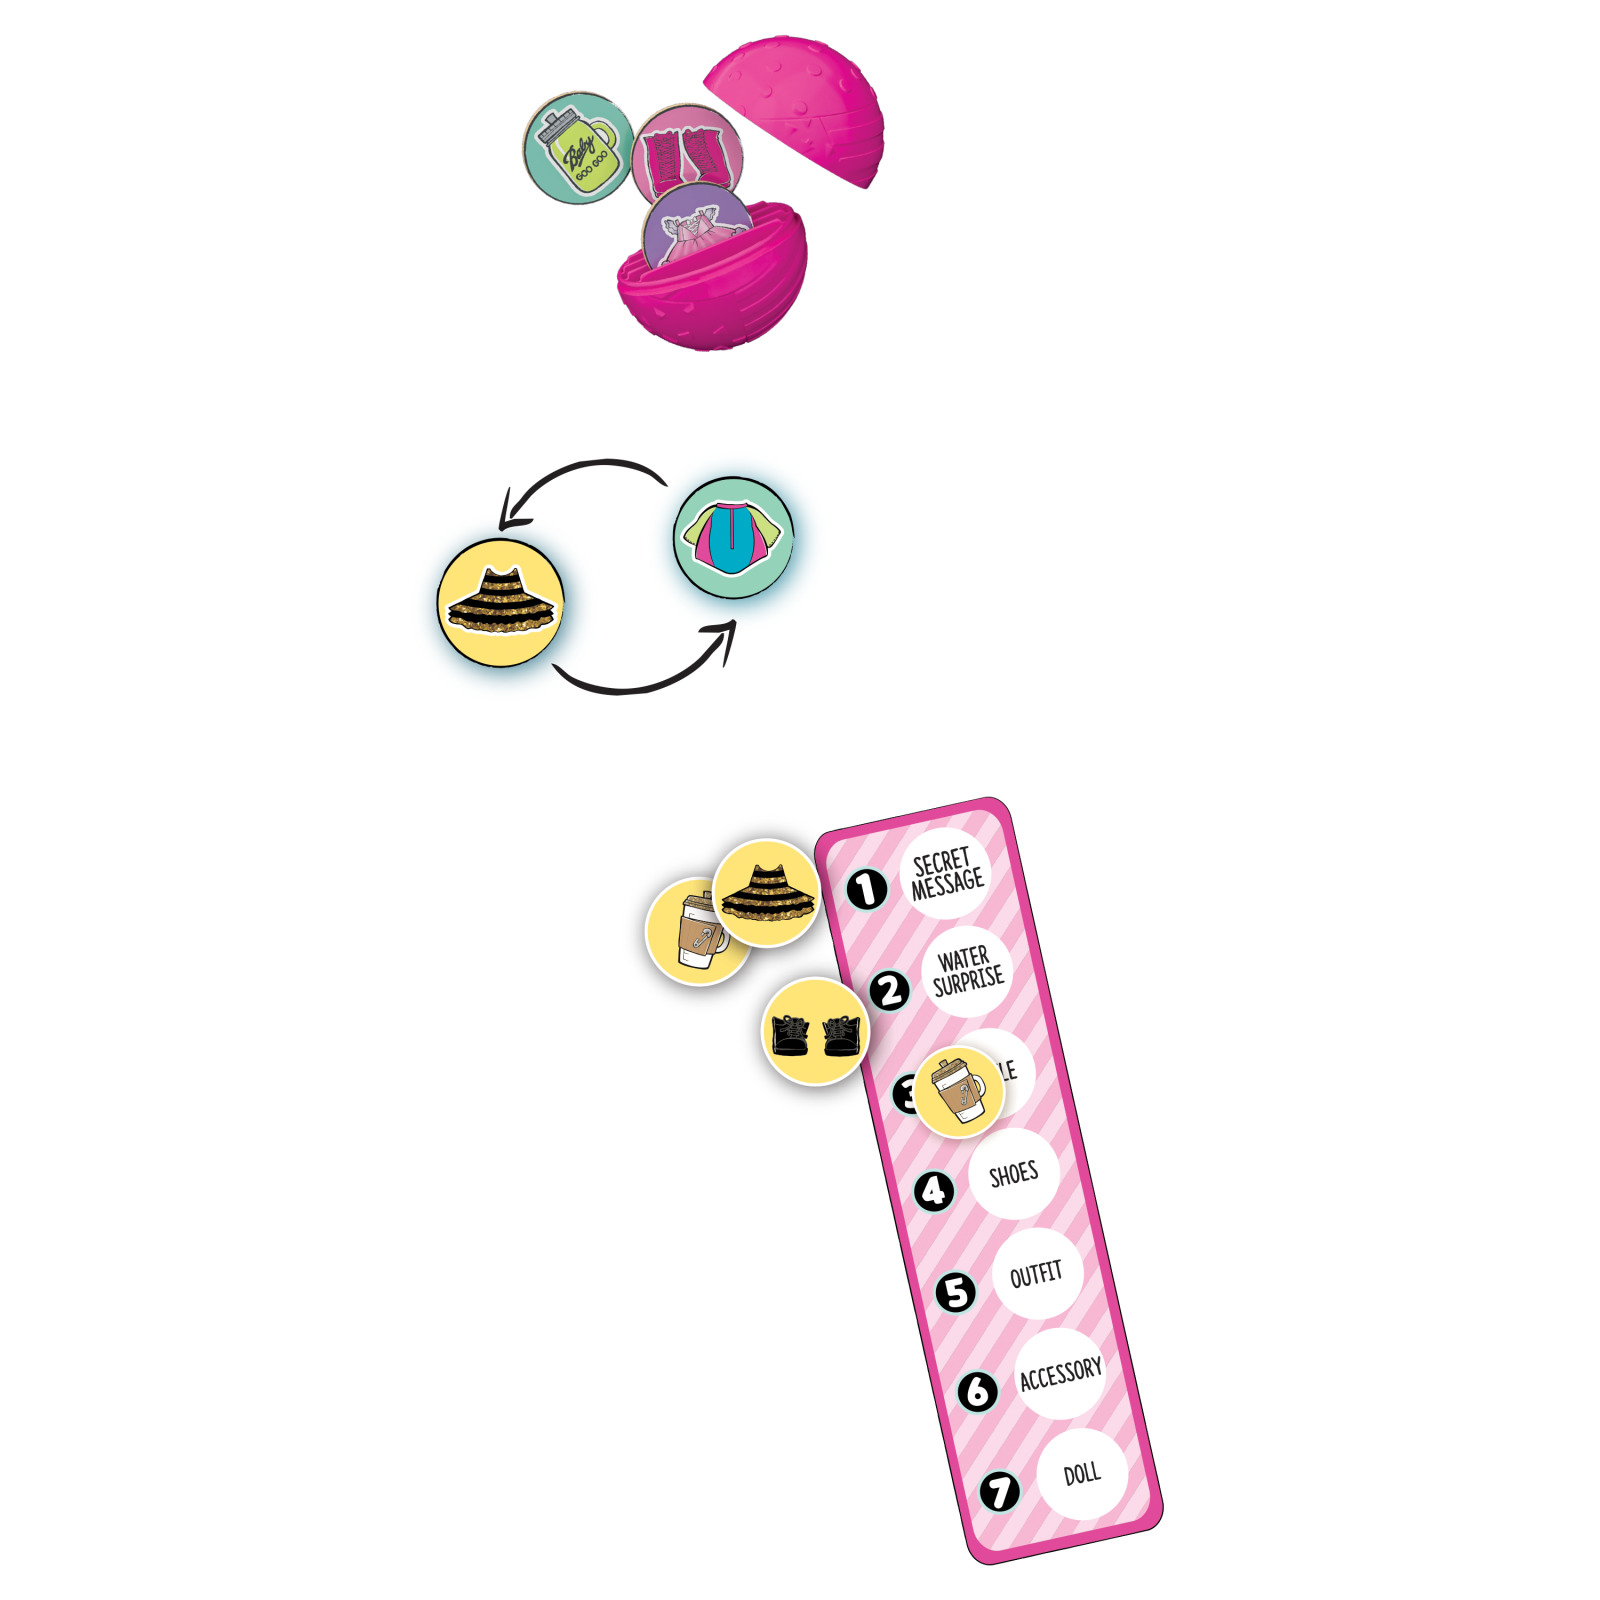 L O L Surprise 7 Layers Of Fun Board Game Walmart Com